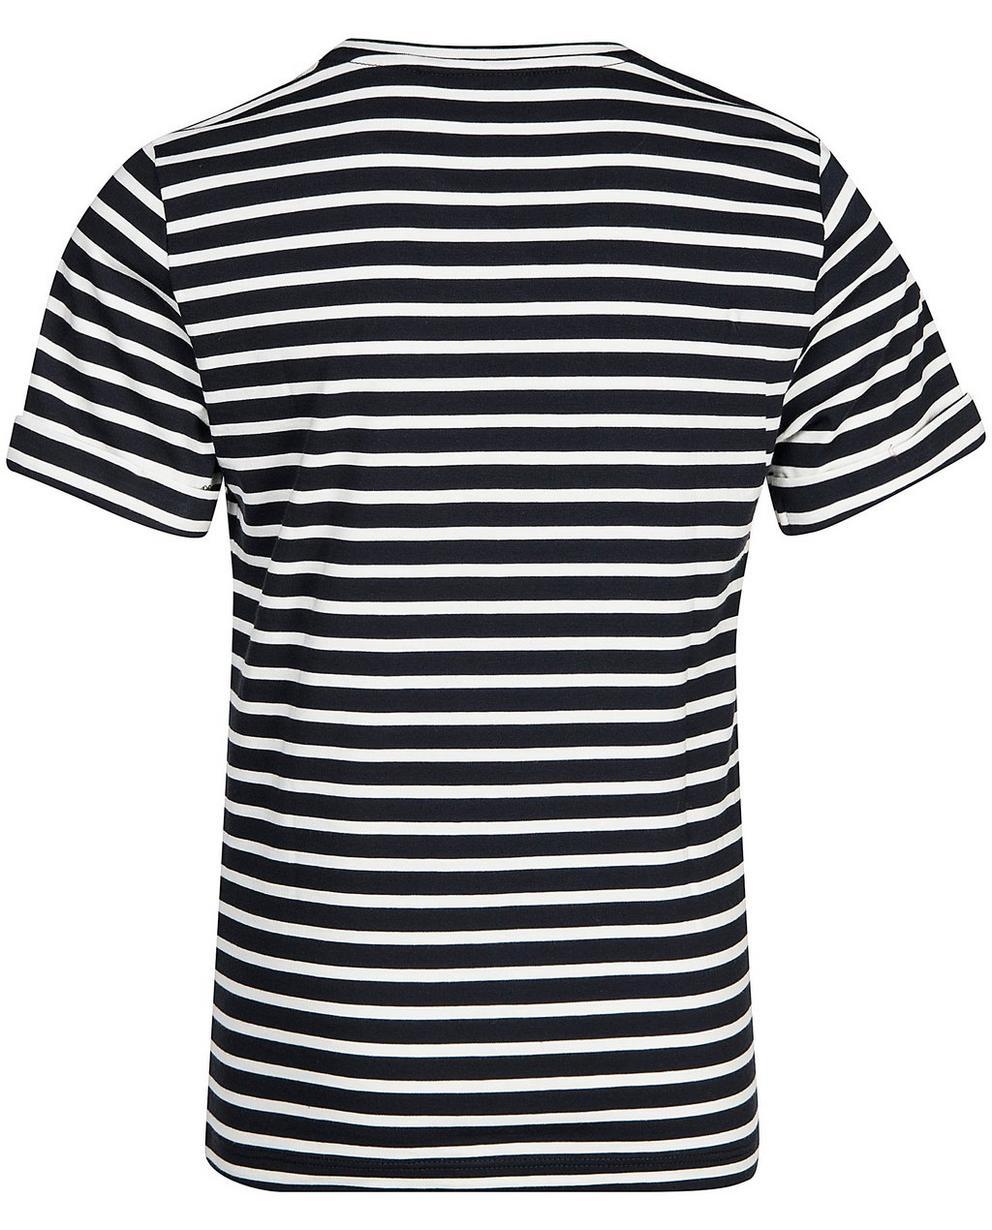 T-Shirts - AO2 - Gestreiftes T-Shirt mit Print